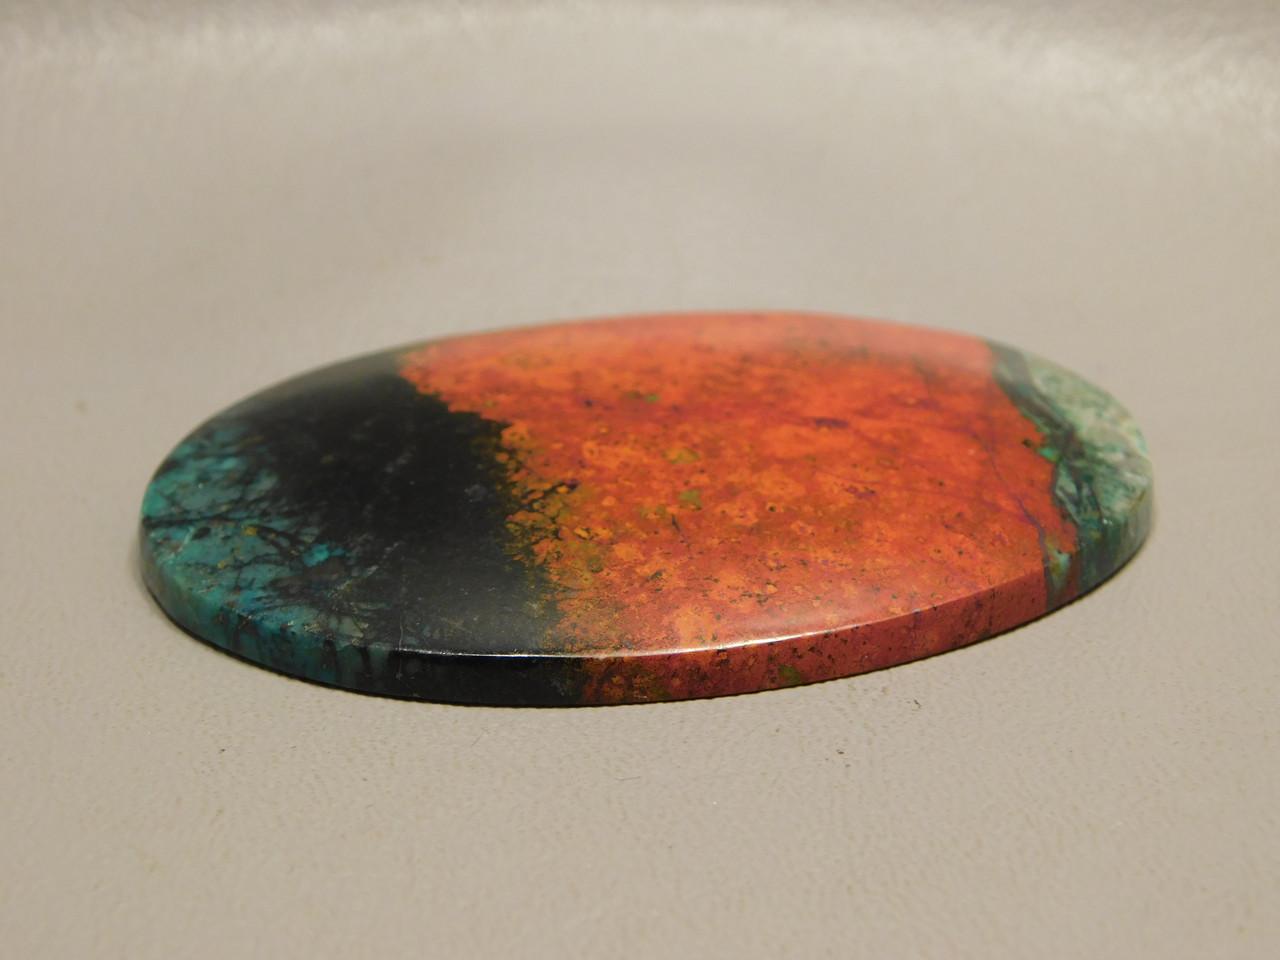 Sonora Sunset Chrysocolla Cuprite Large Cabochon Stone #24